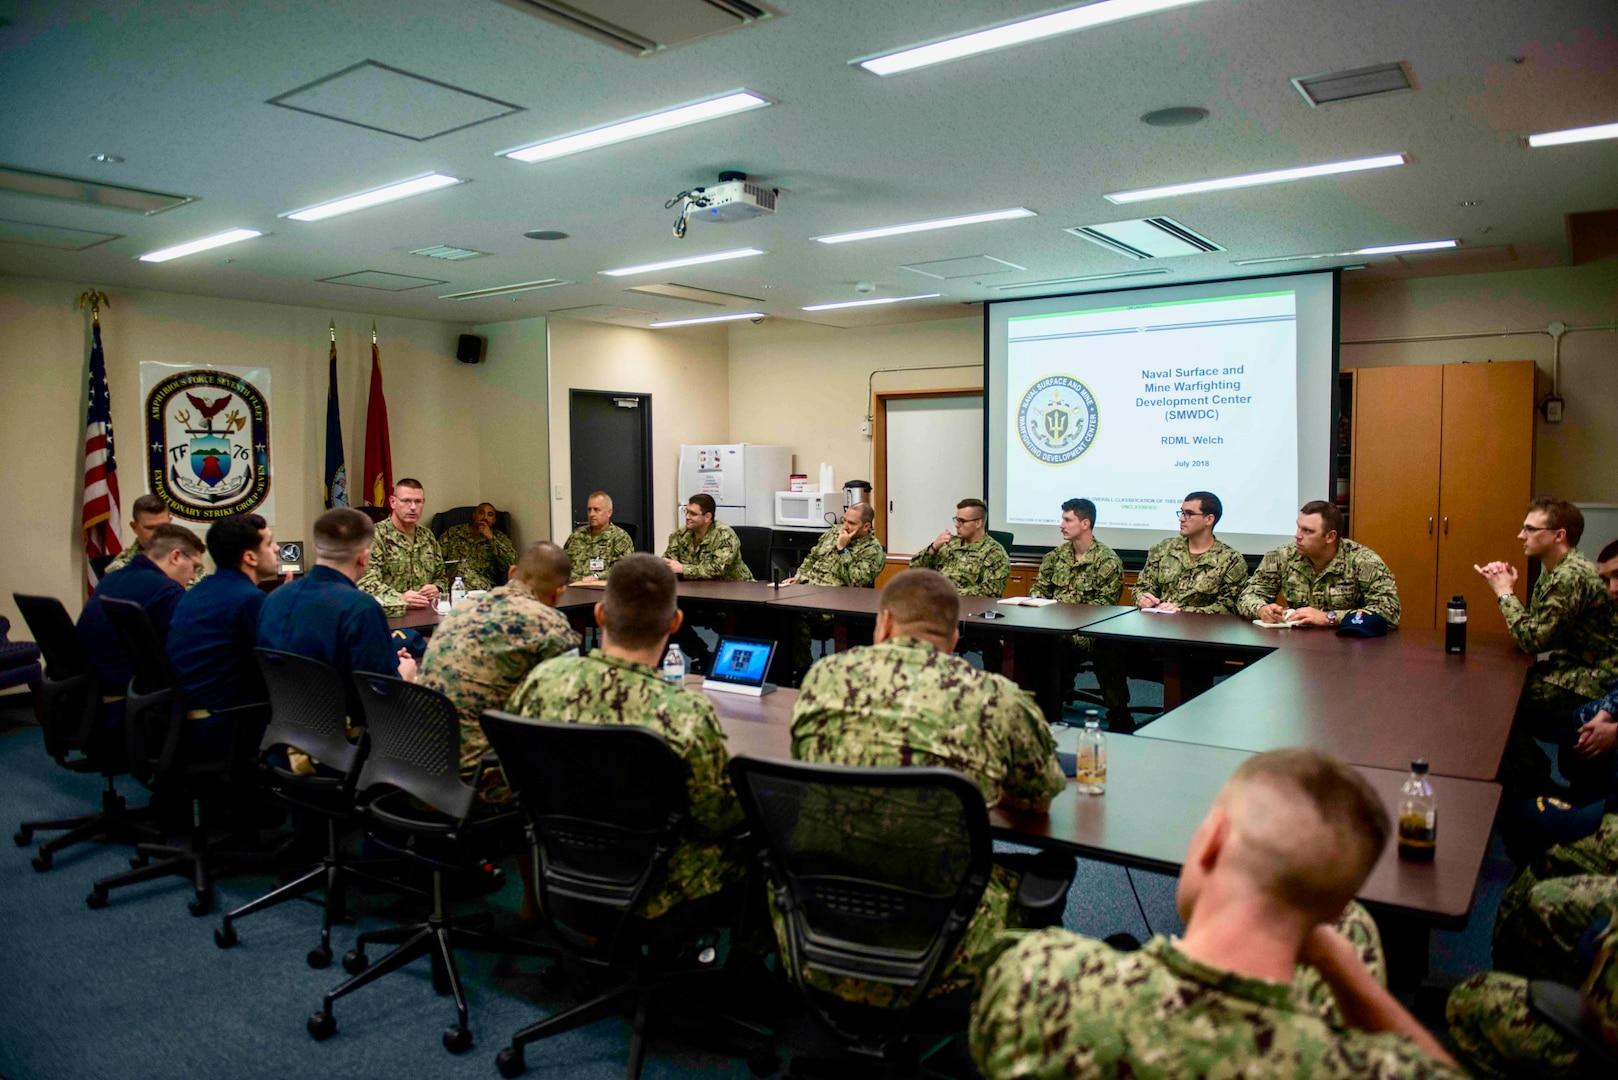 Surface Navy's Warfighting Development Center and Global Mine Warfare Commander Visits Sasebo